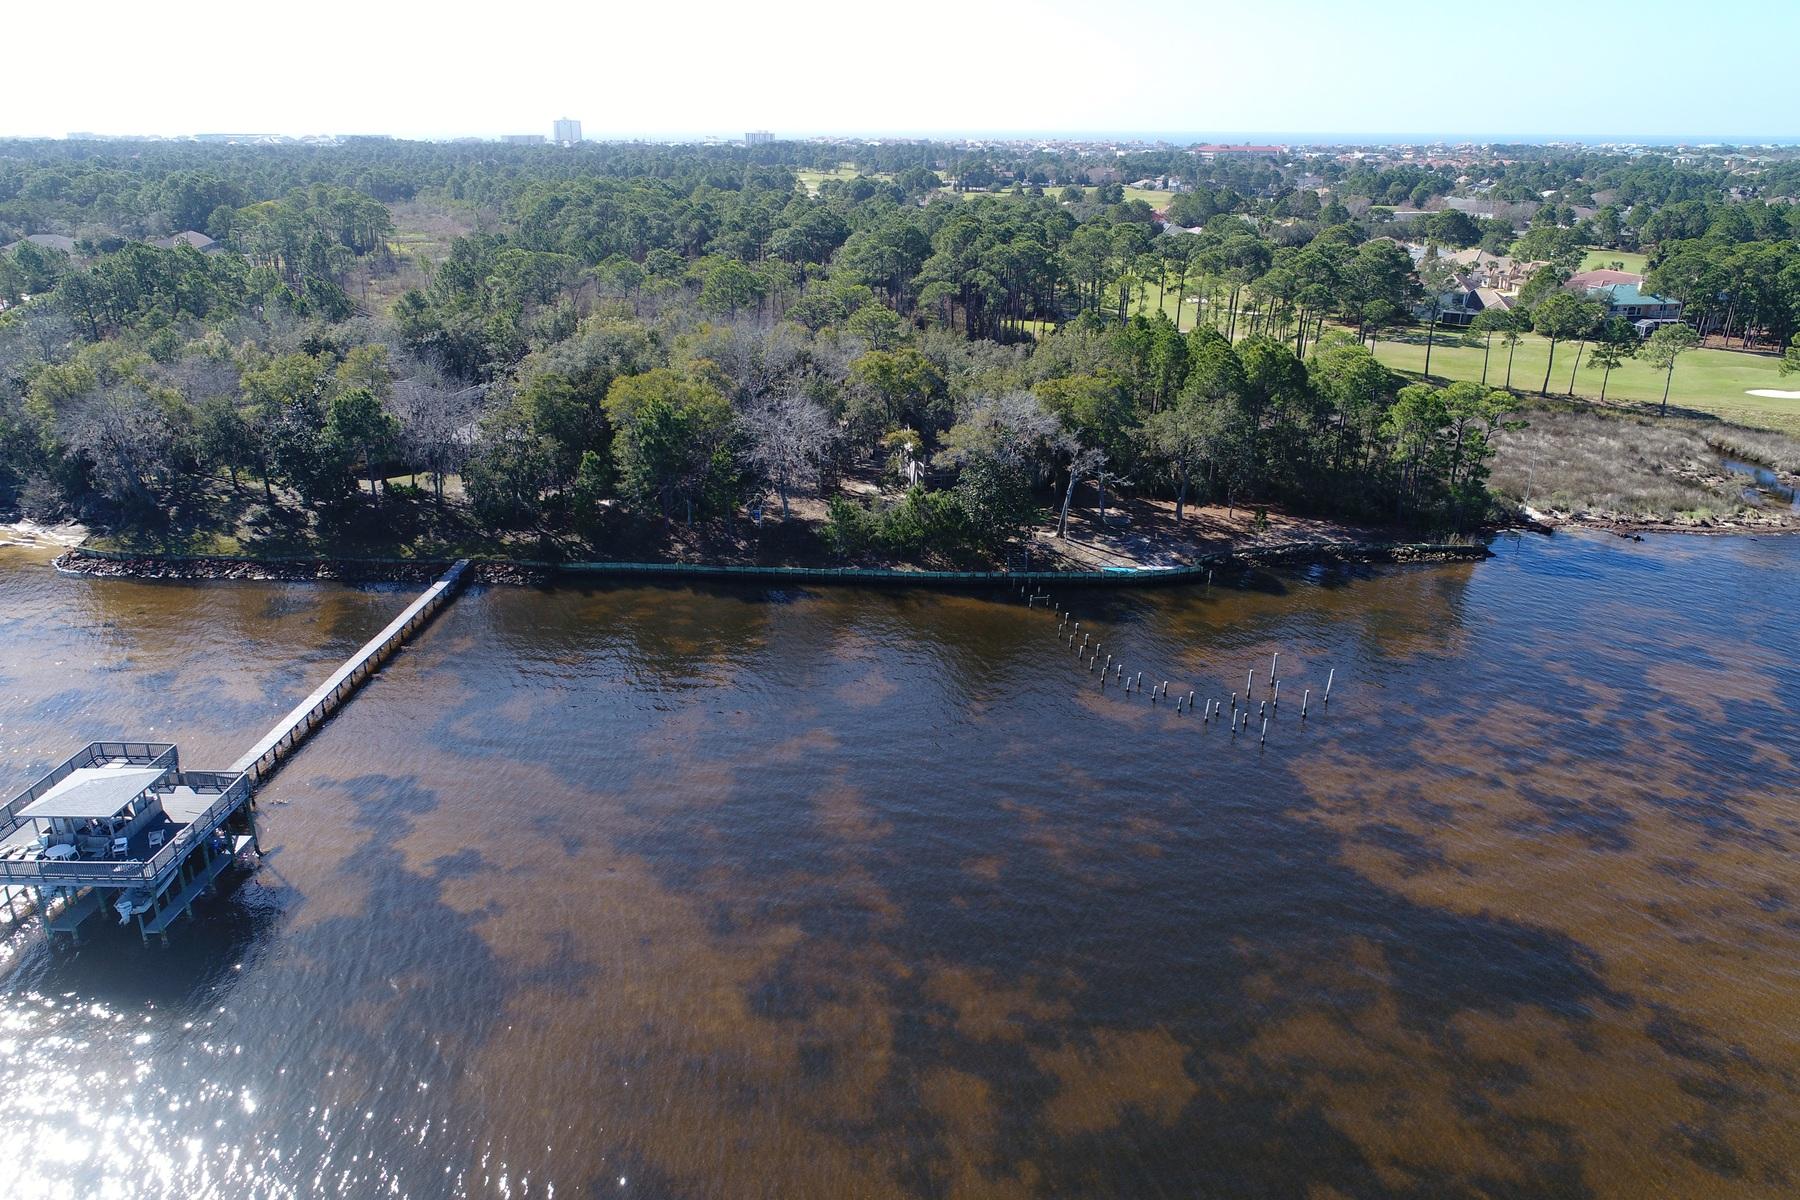 Terreno para Venda às EXCEPTIONAL HOMESITE LOCATED ON 100 FEET OF BAYFRONT Lot 26 Walton Way Miramar Beach, Florida, 32550 Estados Unidos